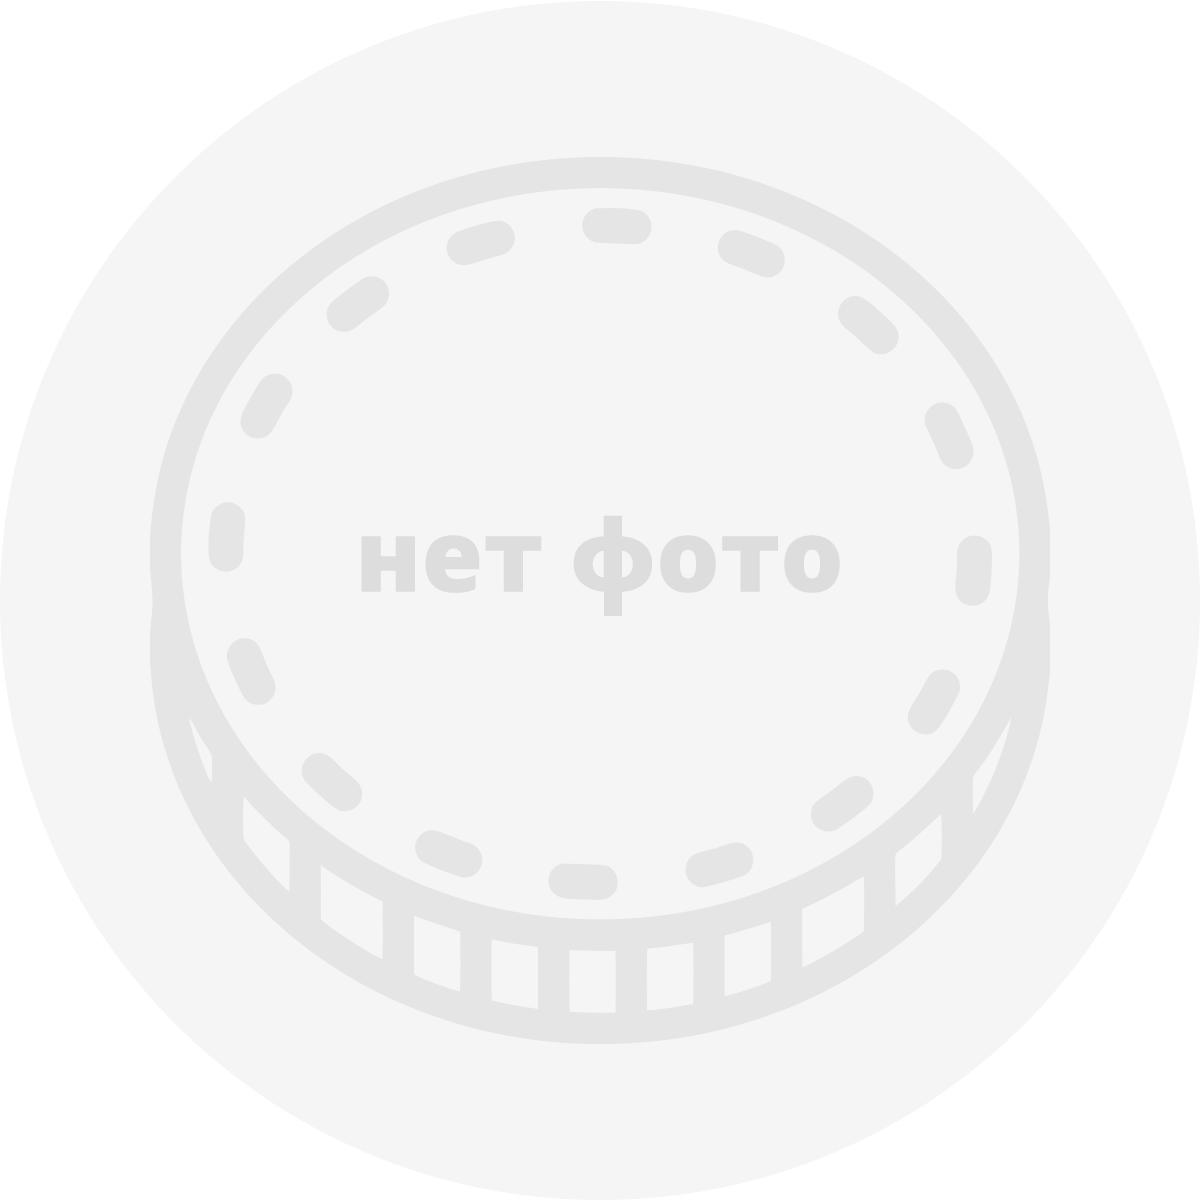 2 lati 1925 года цена в украине купюра в 500 евро